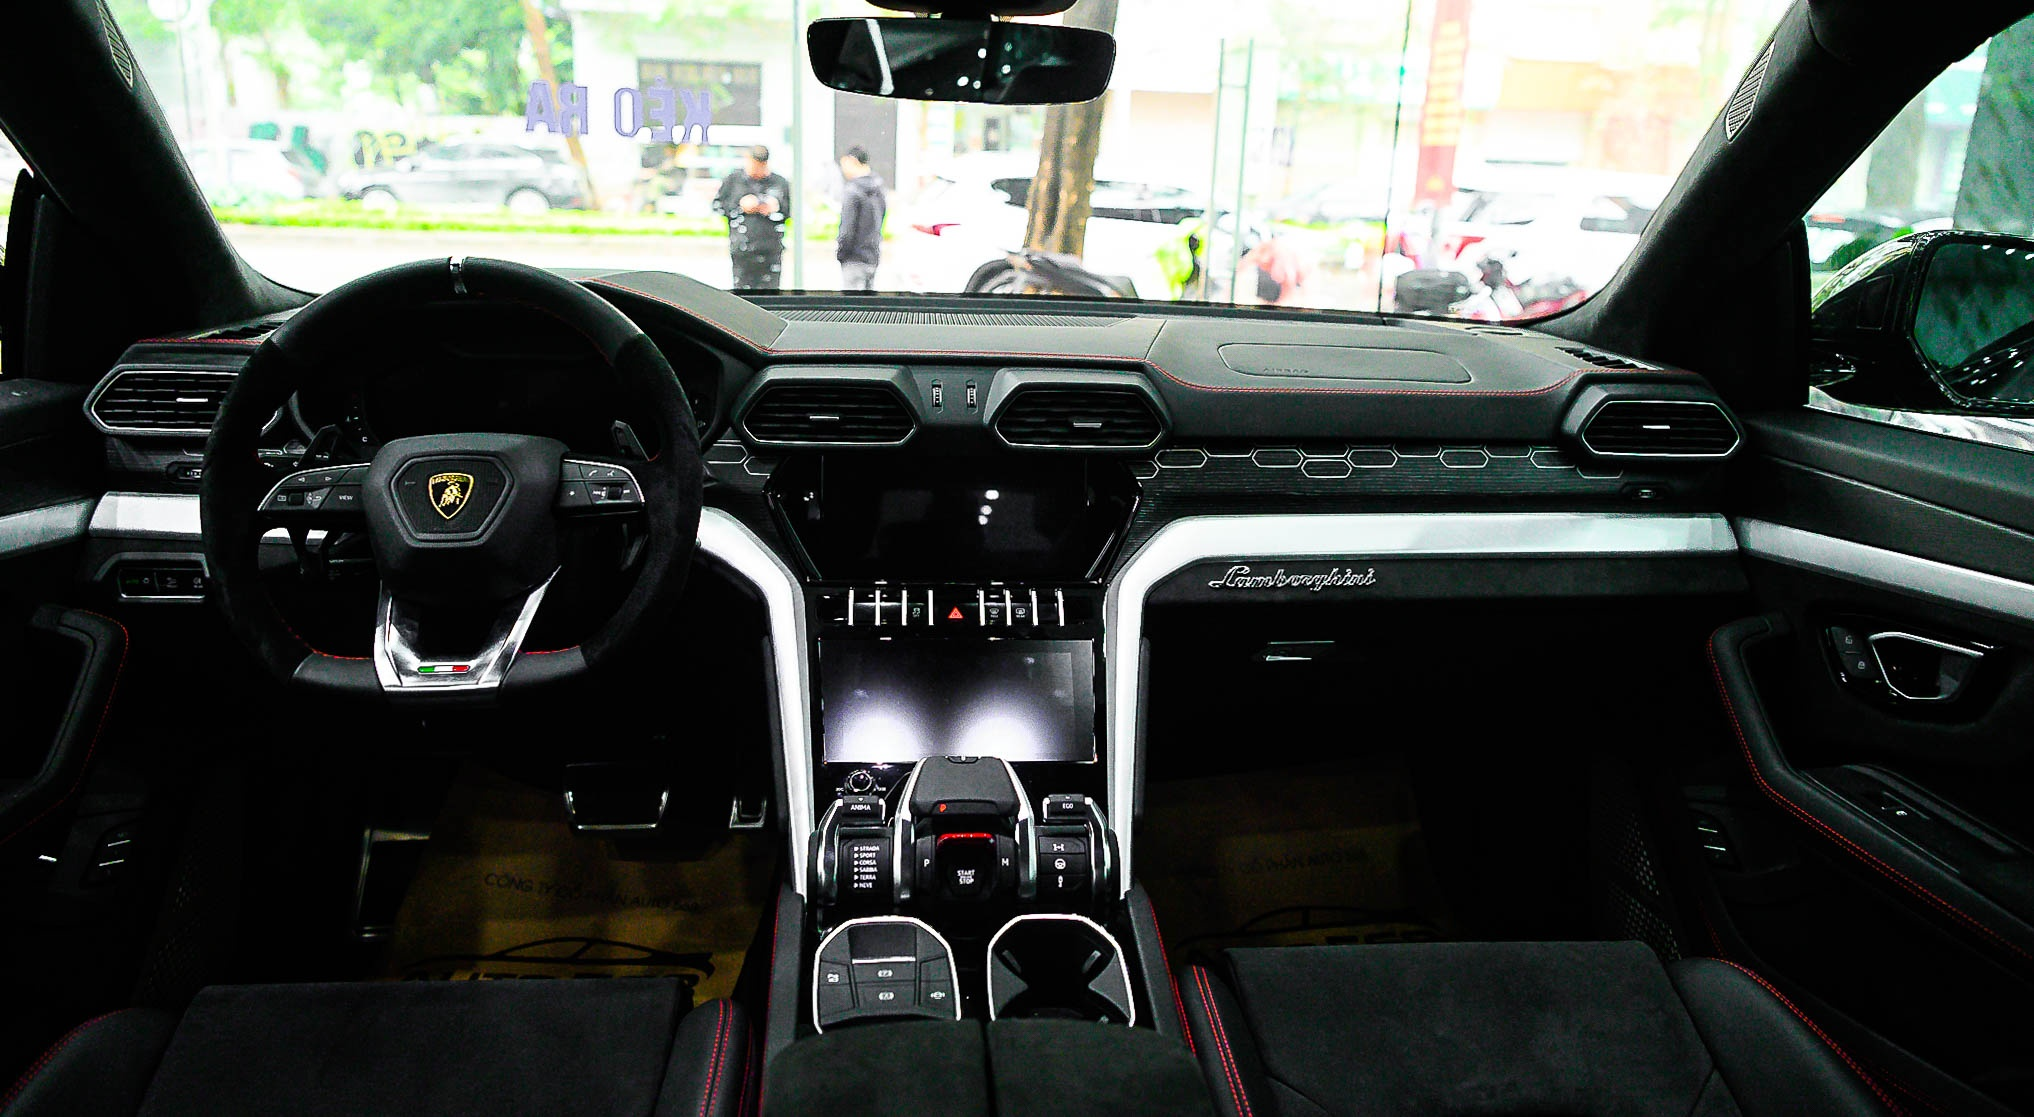 Ngam Lamborghini Urus mau den dau tien ve VN, gia khoang 1 trieu USD hinh anh 19 Urus_zing_11_.jpg